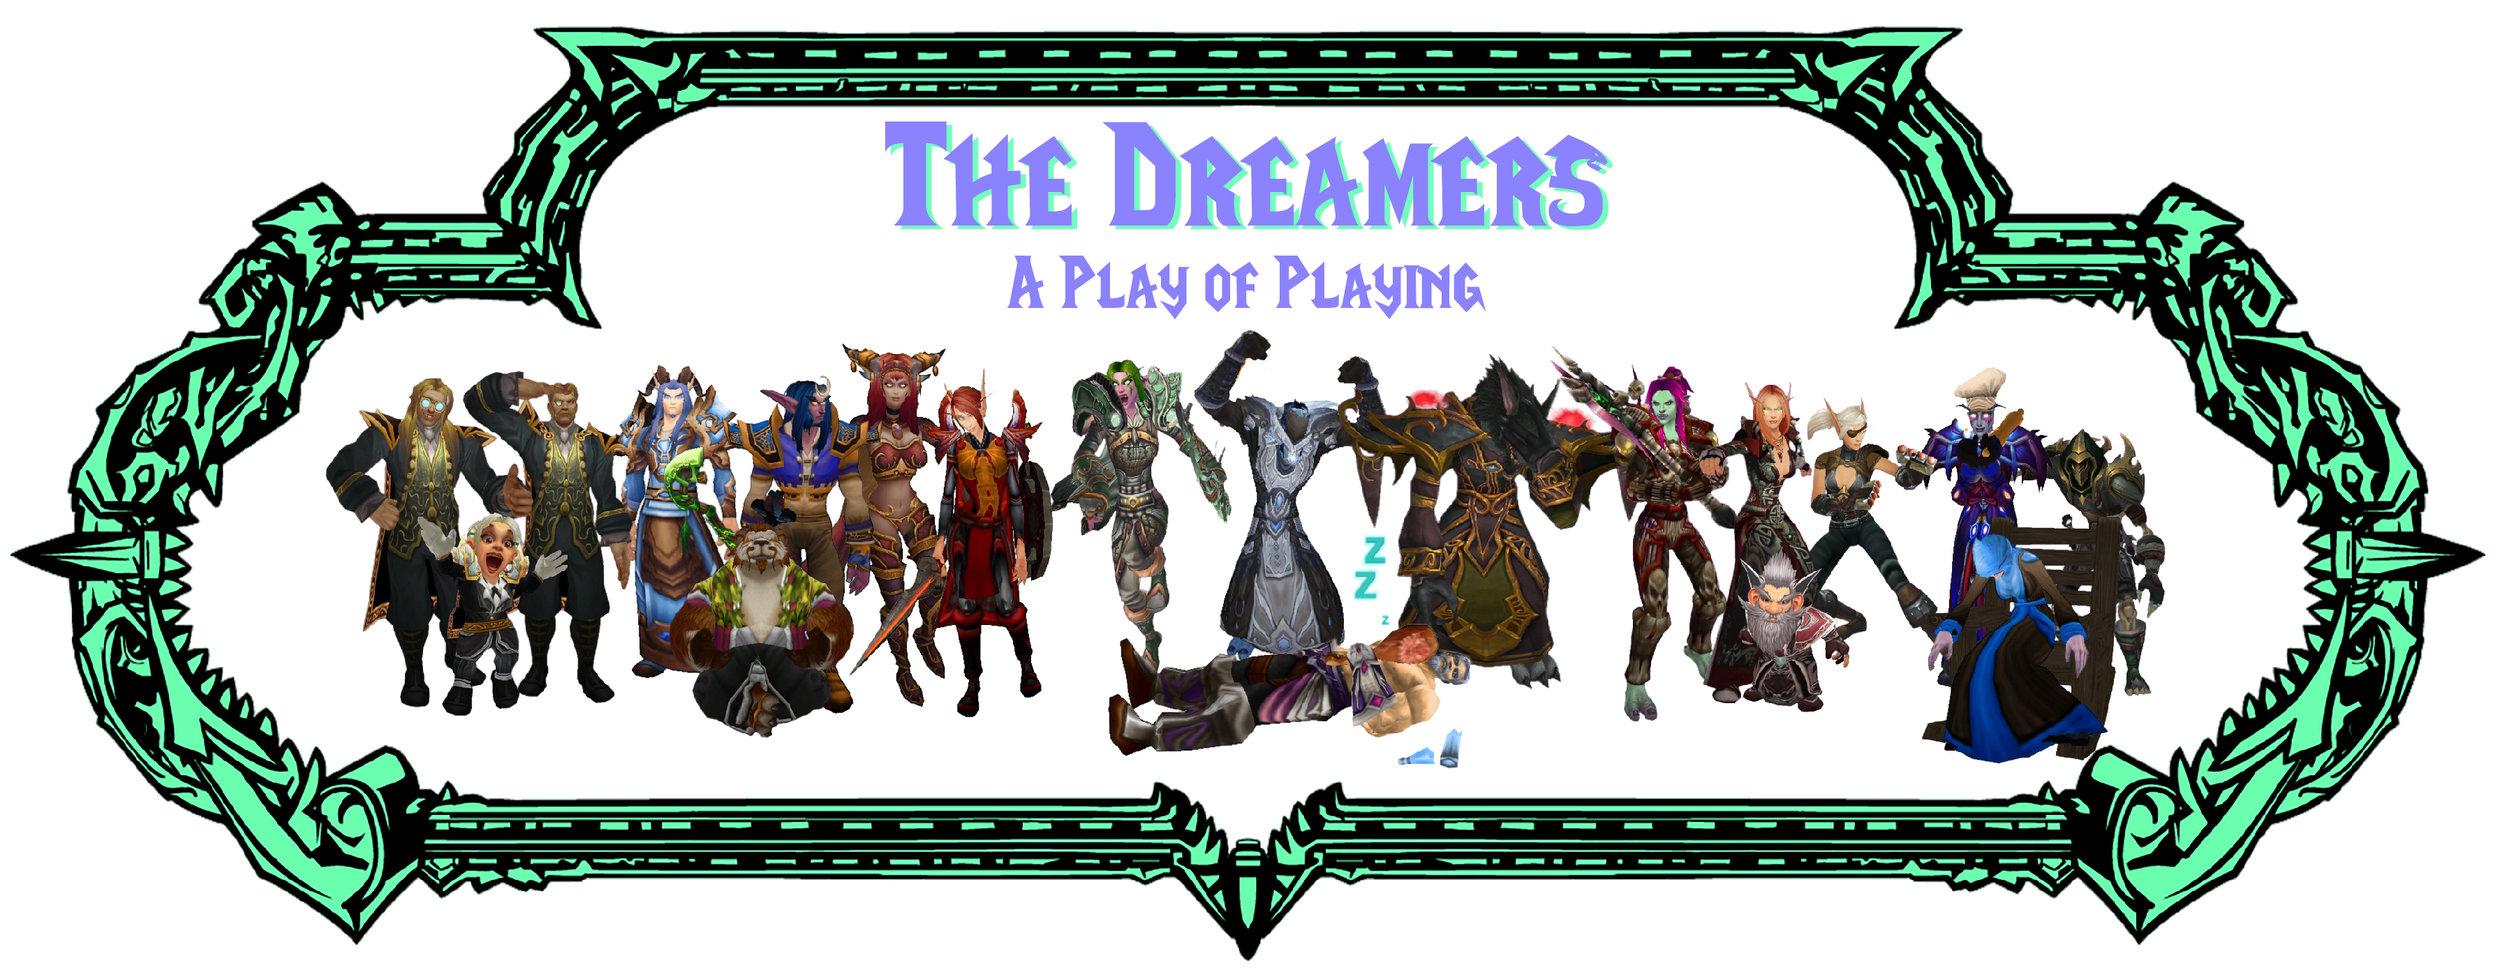 The Dreamer's Machinima Cast Shot.jpg